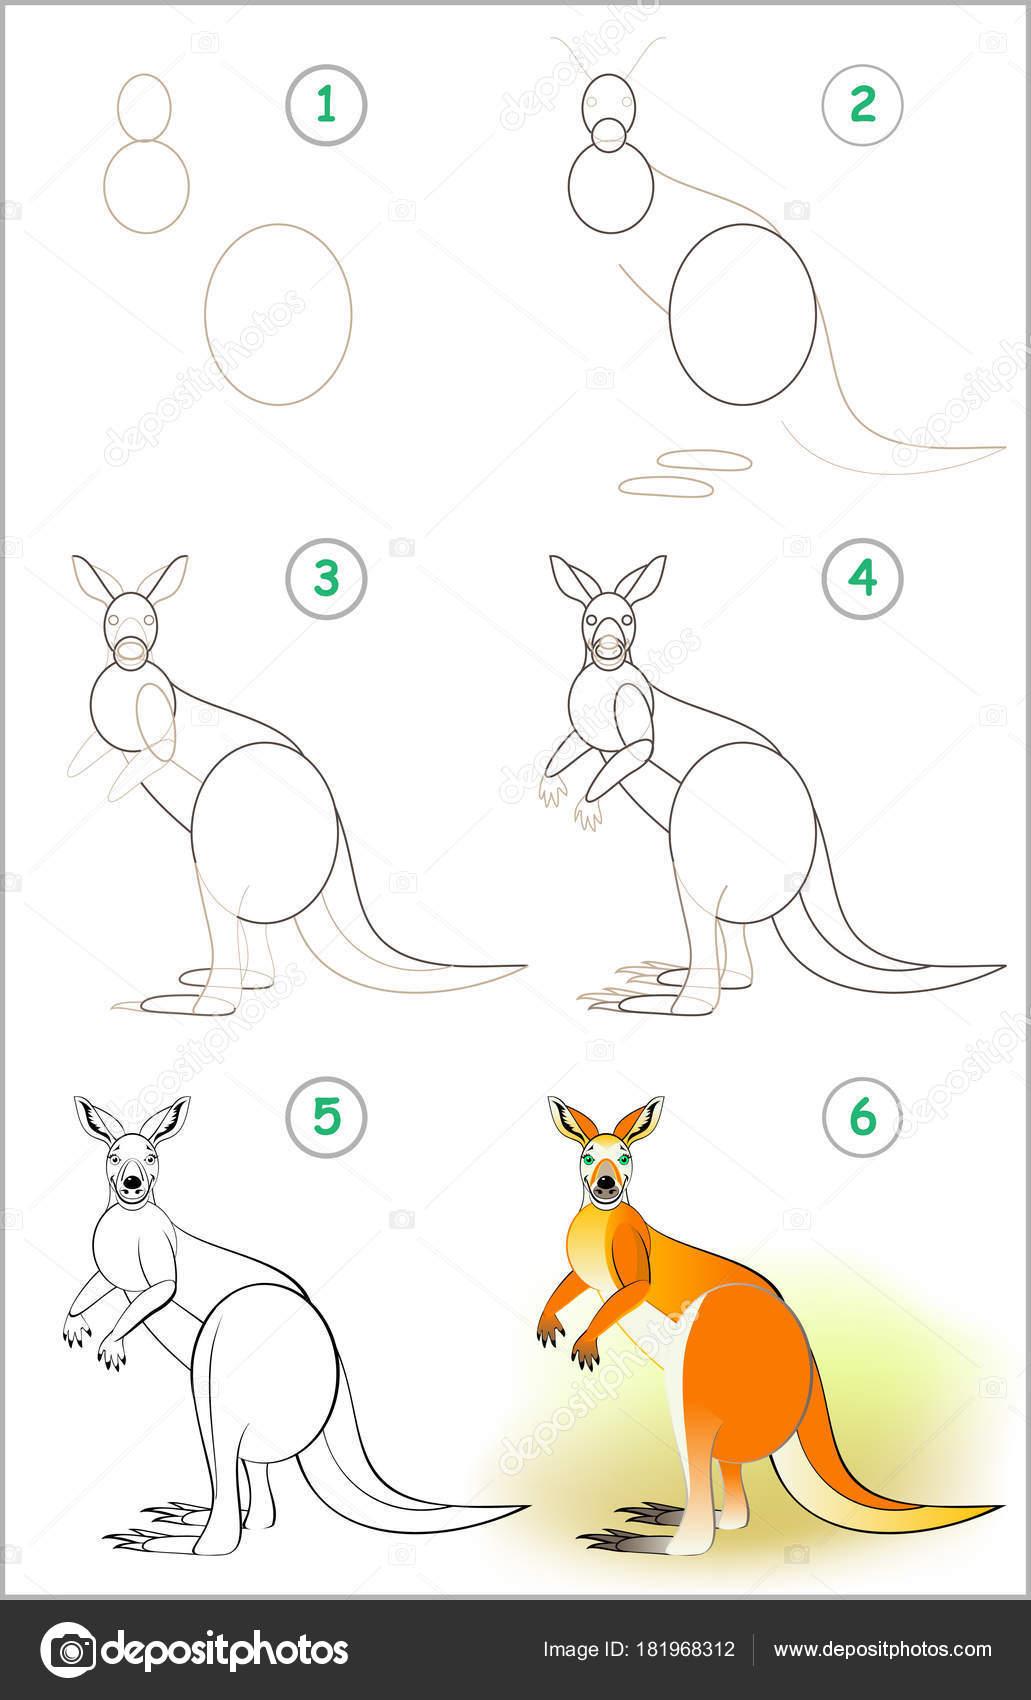 Str nka ukazuje jak krok krokem nau it kreslit roztomil - Dessiner un kangourou ...